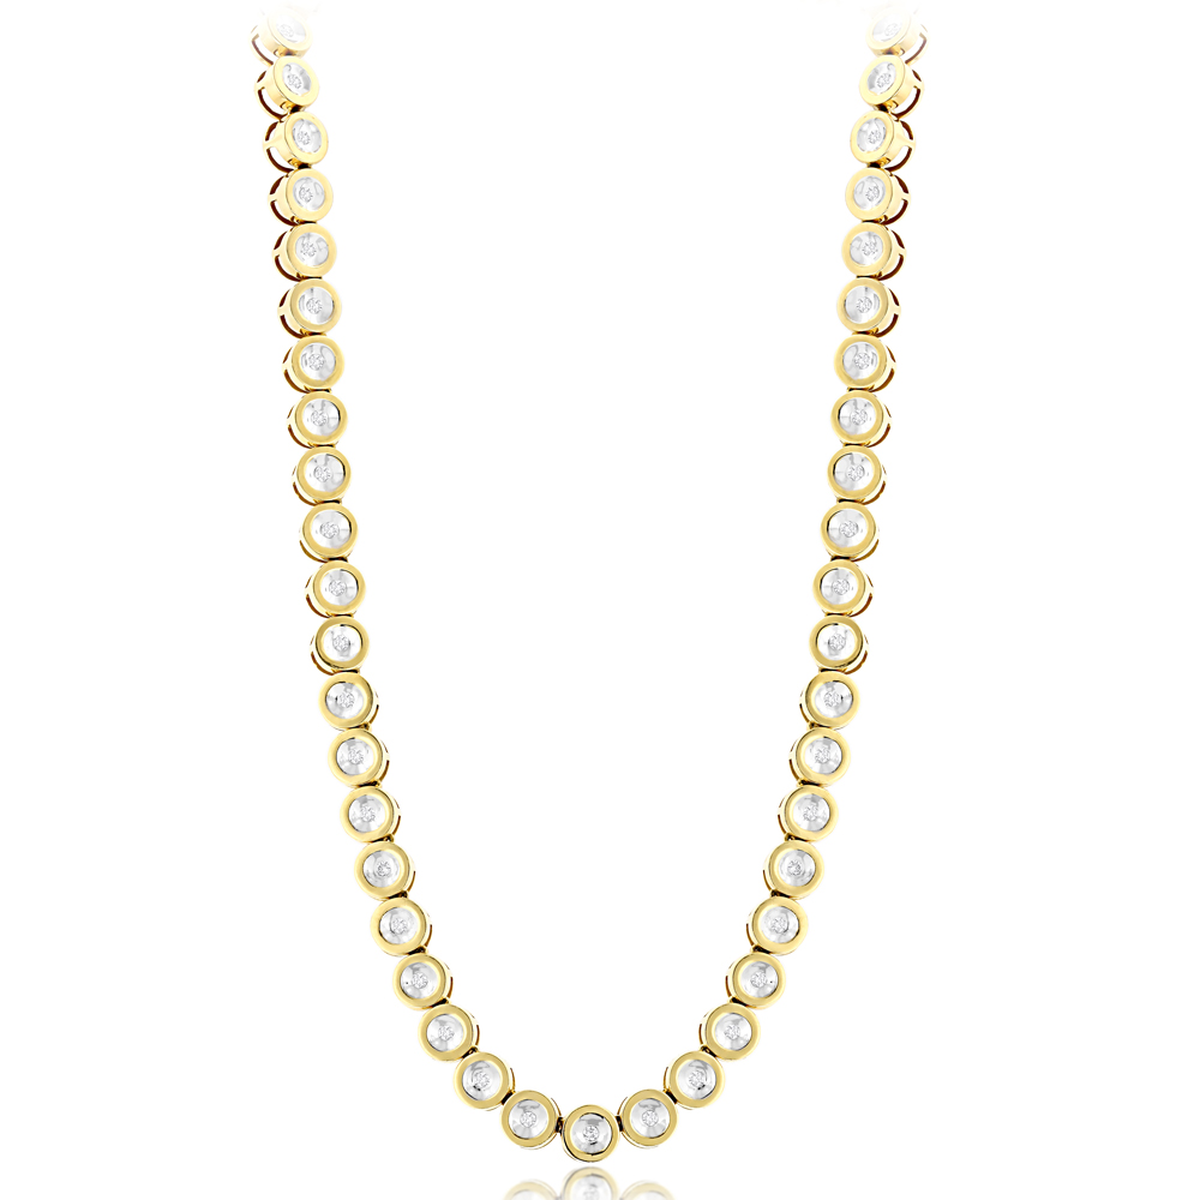 14K Gold Bezel Set Round Diamond Chain Necklace 4.75ct